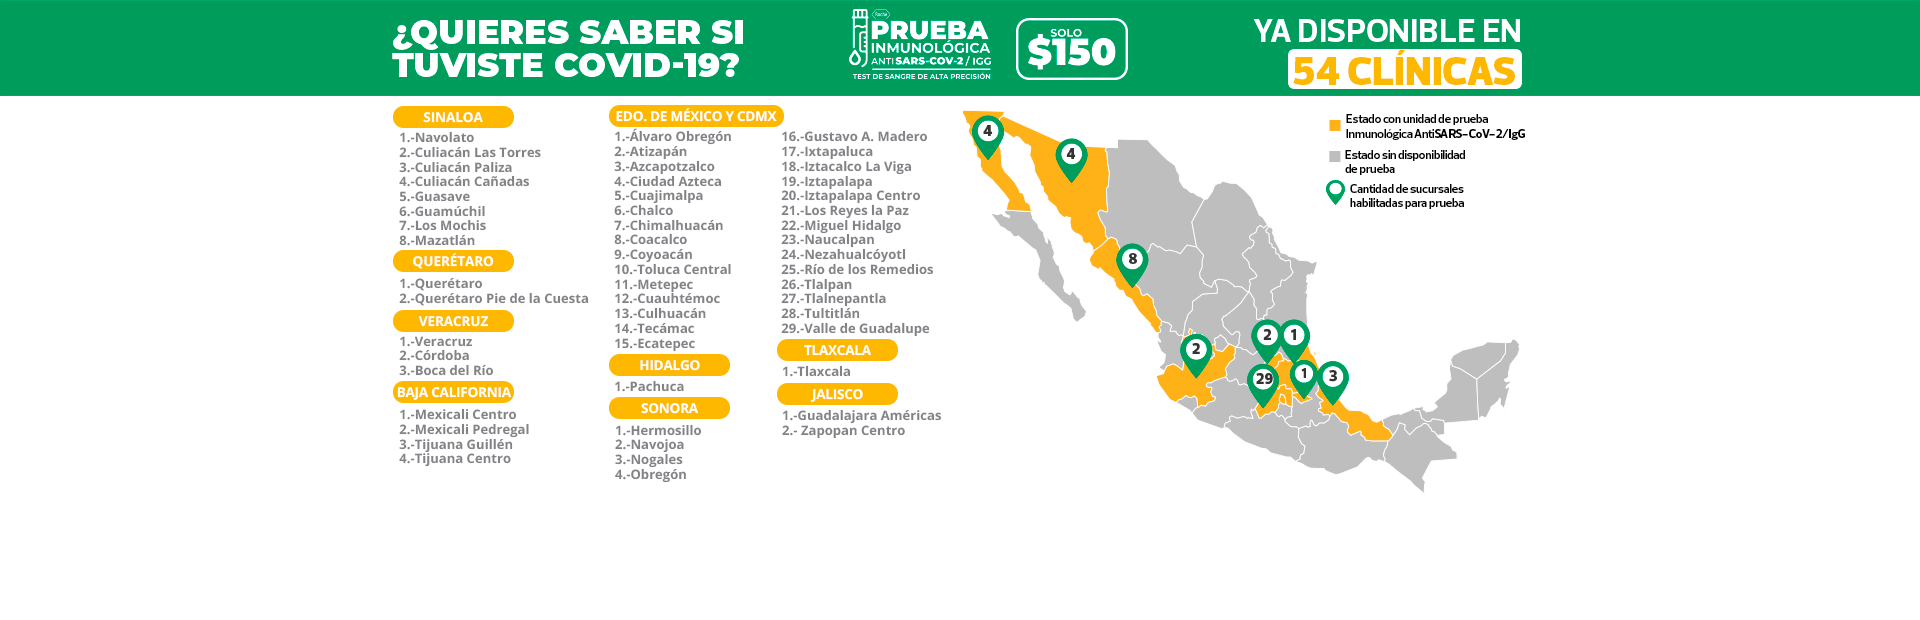 Banner mapa de clinicas abiertas